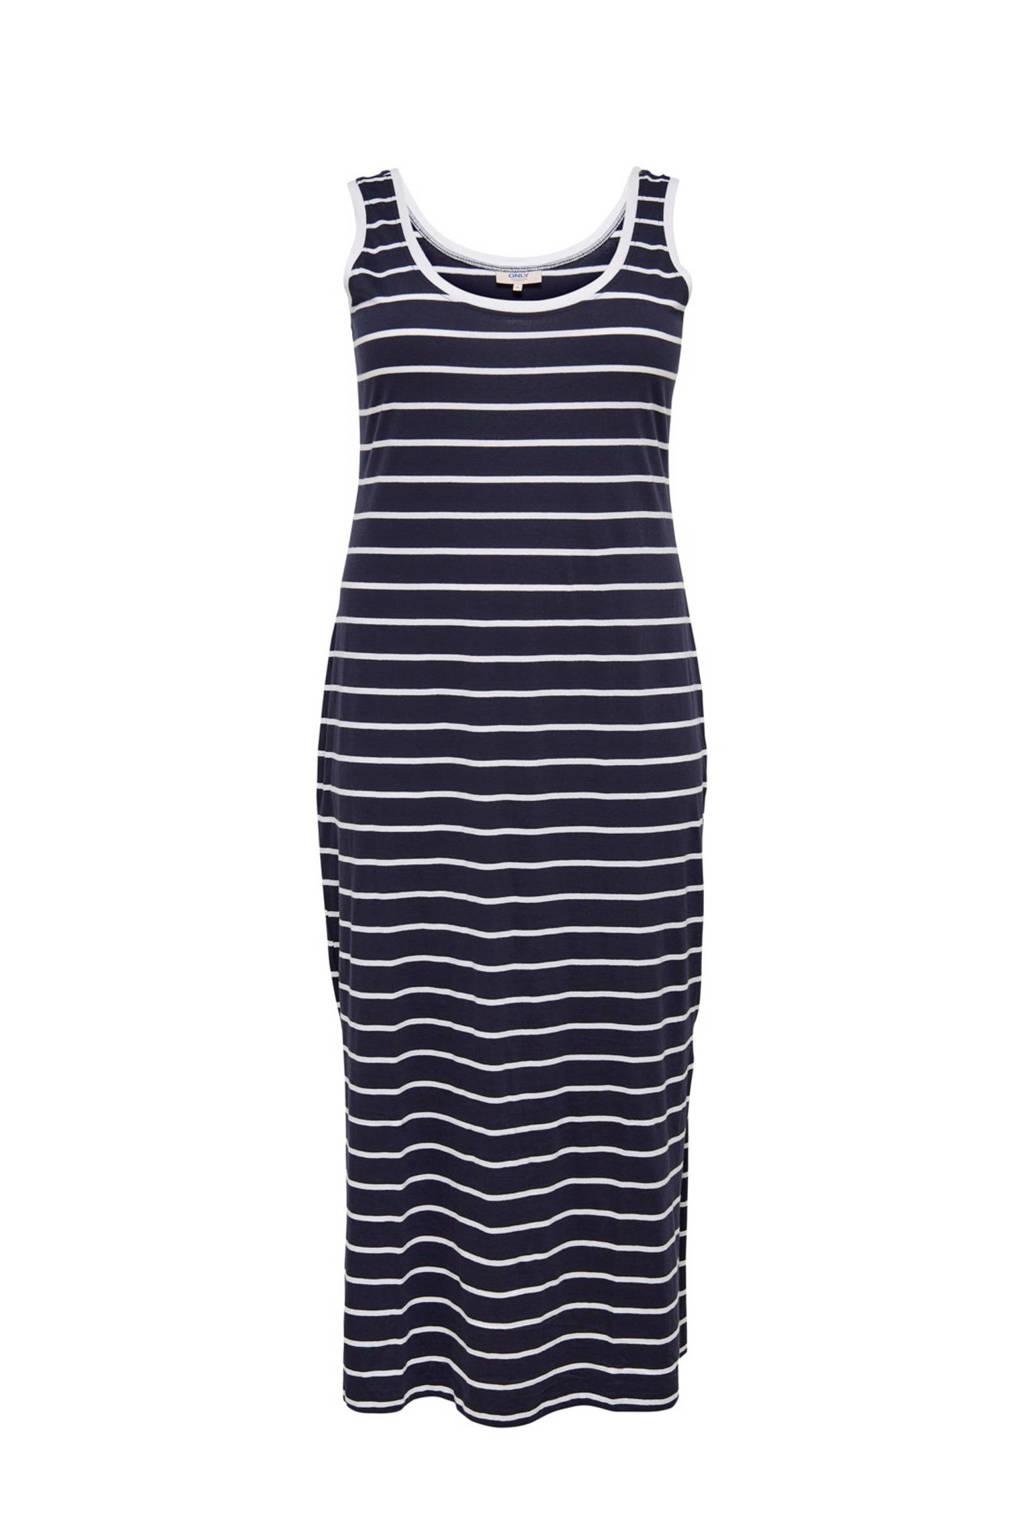 ONLY carmakoma gestreepte maxi jurk donkerblauw, Donkerblauw/wit